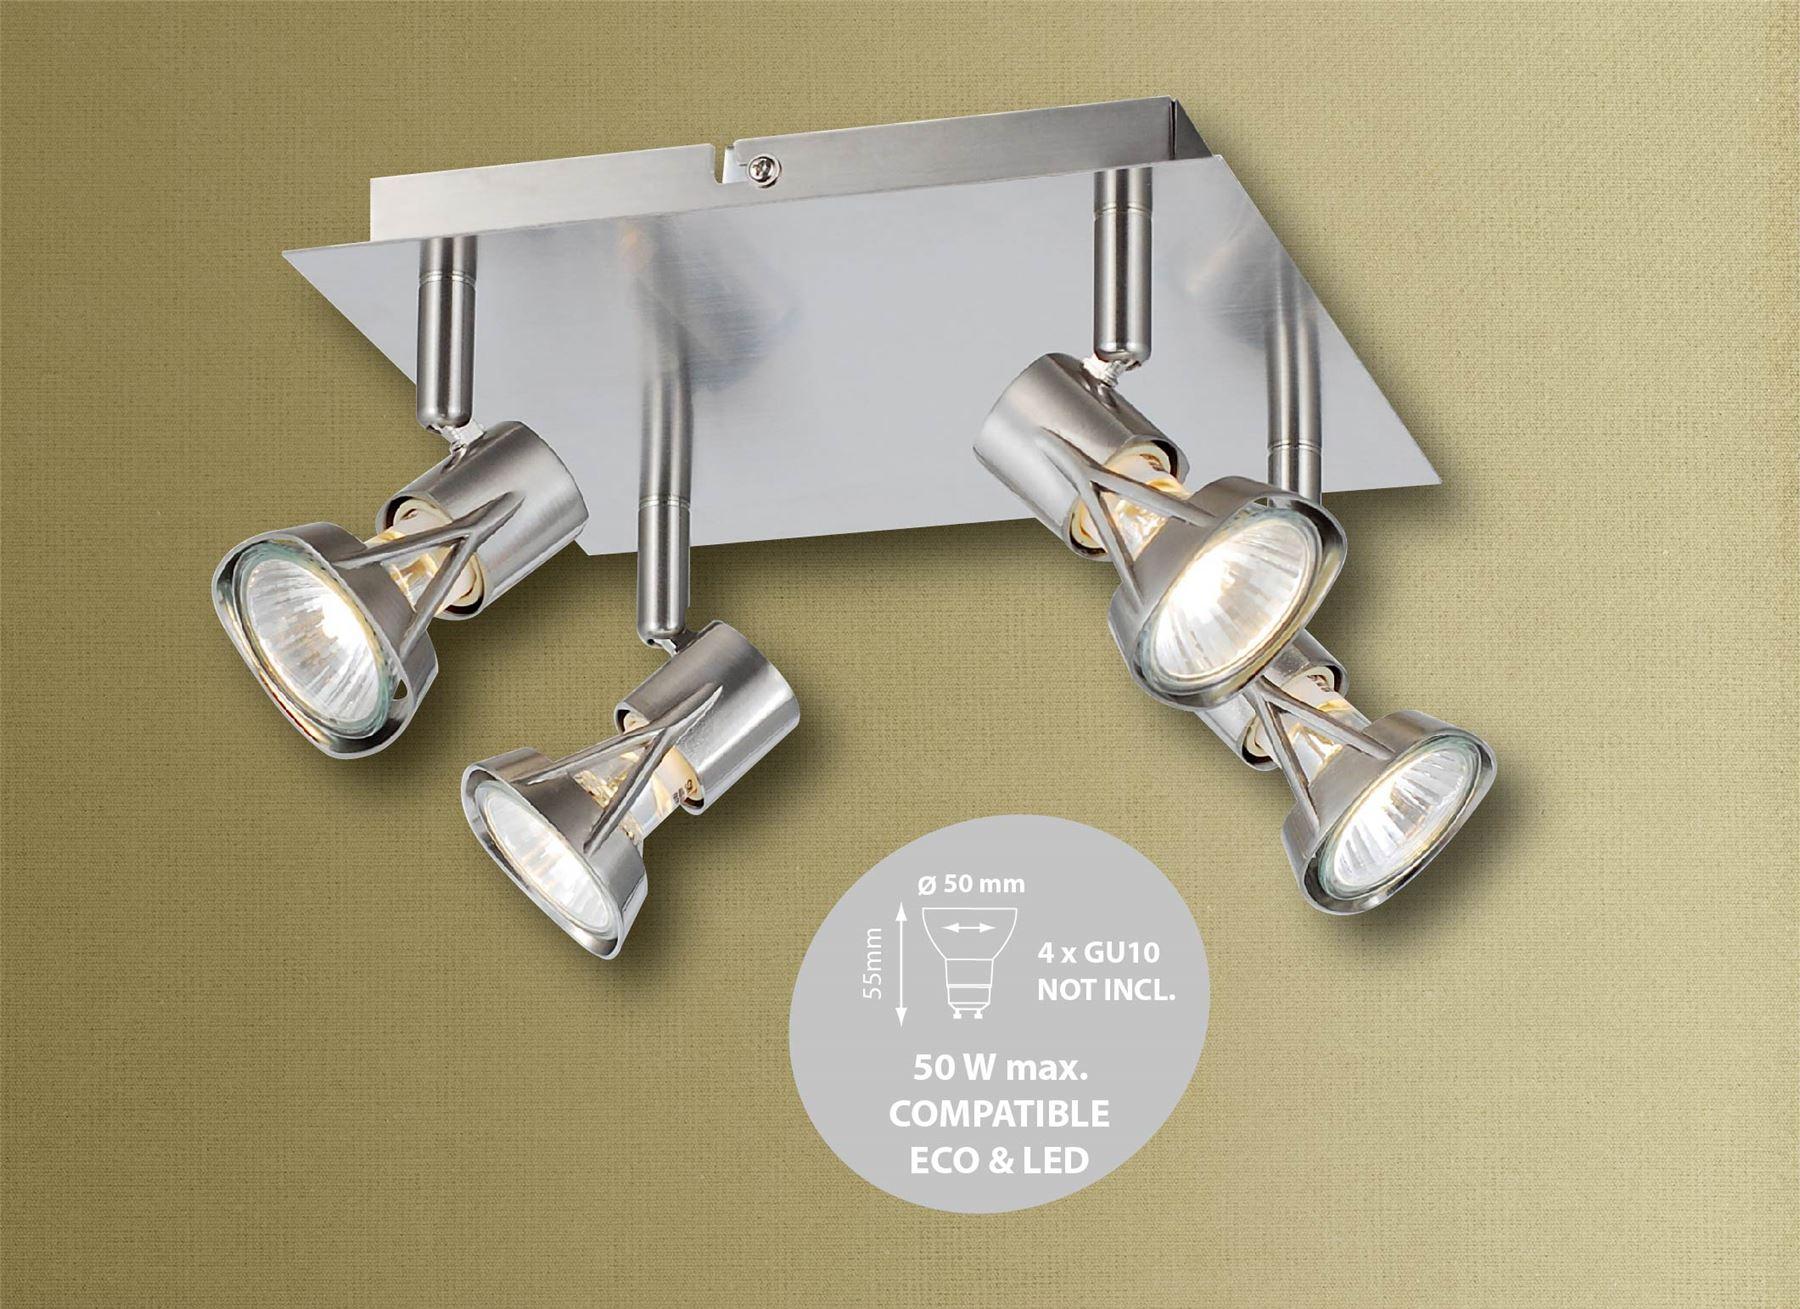 1 2 3 4 Way Spotlight Bar Die-Cast Lamp Cap Ceiling Light GU10 in Satin